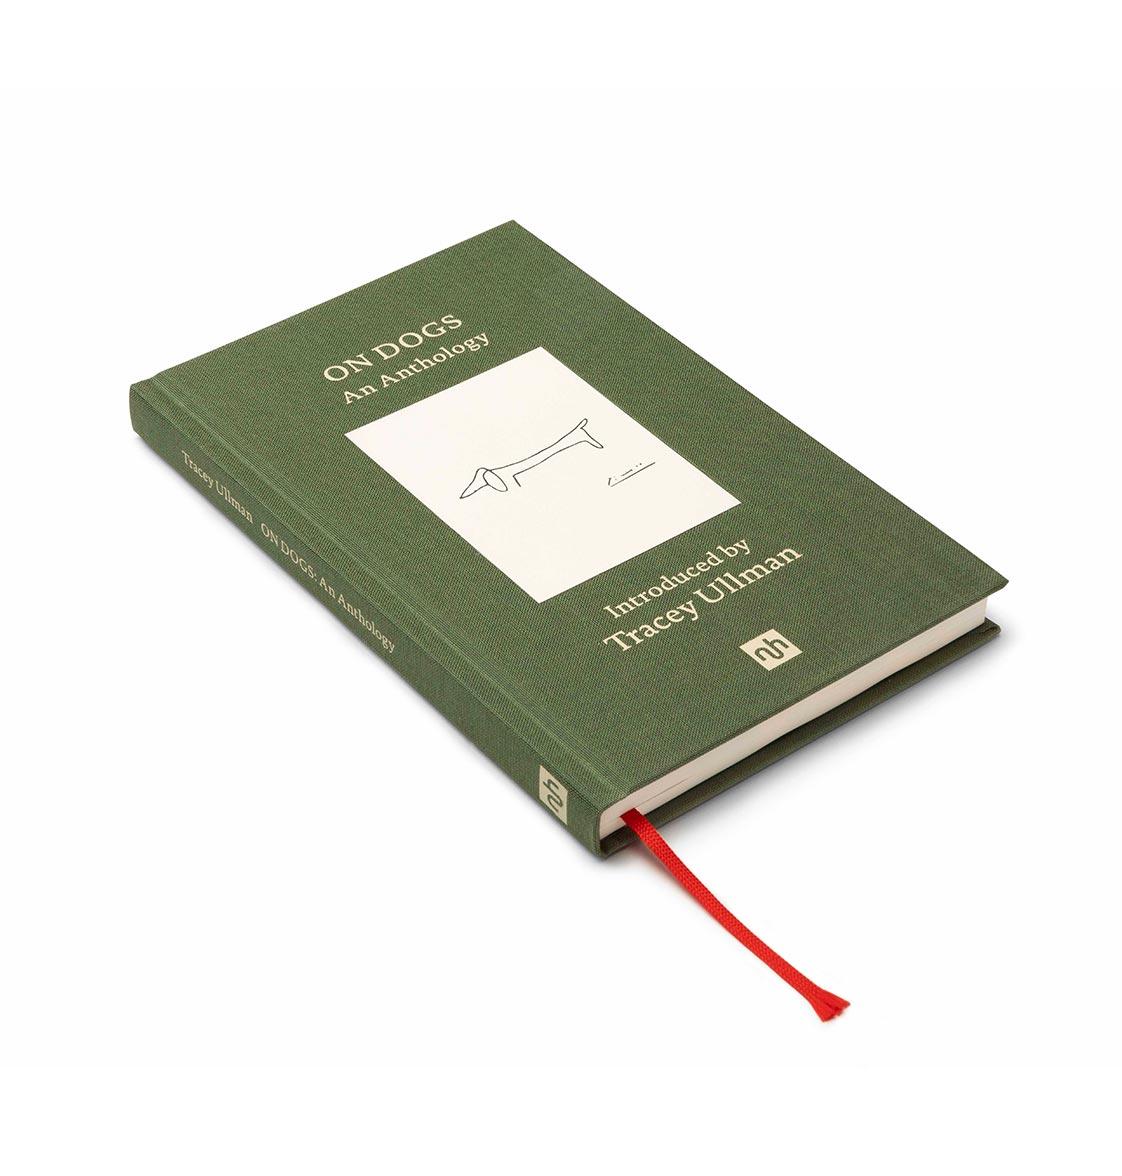 ON-DOGS-ANGLED-2-Single-Book-Close-ups